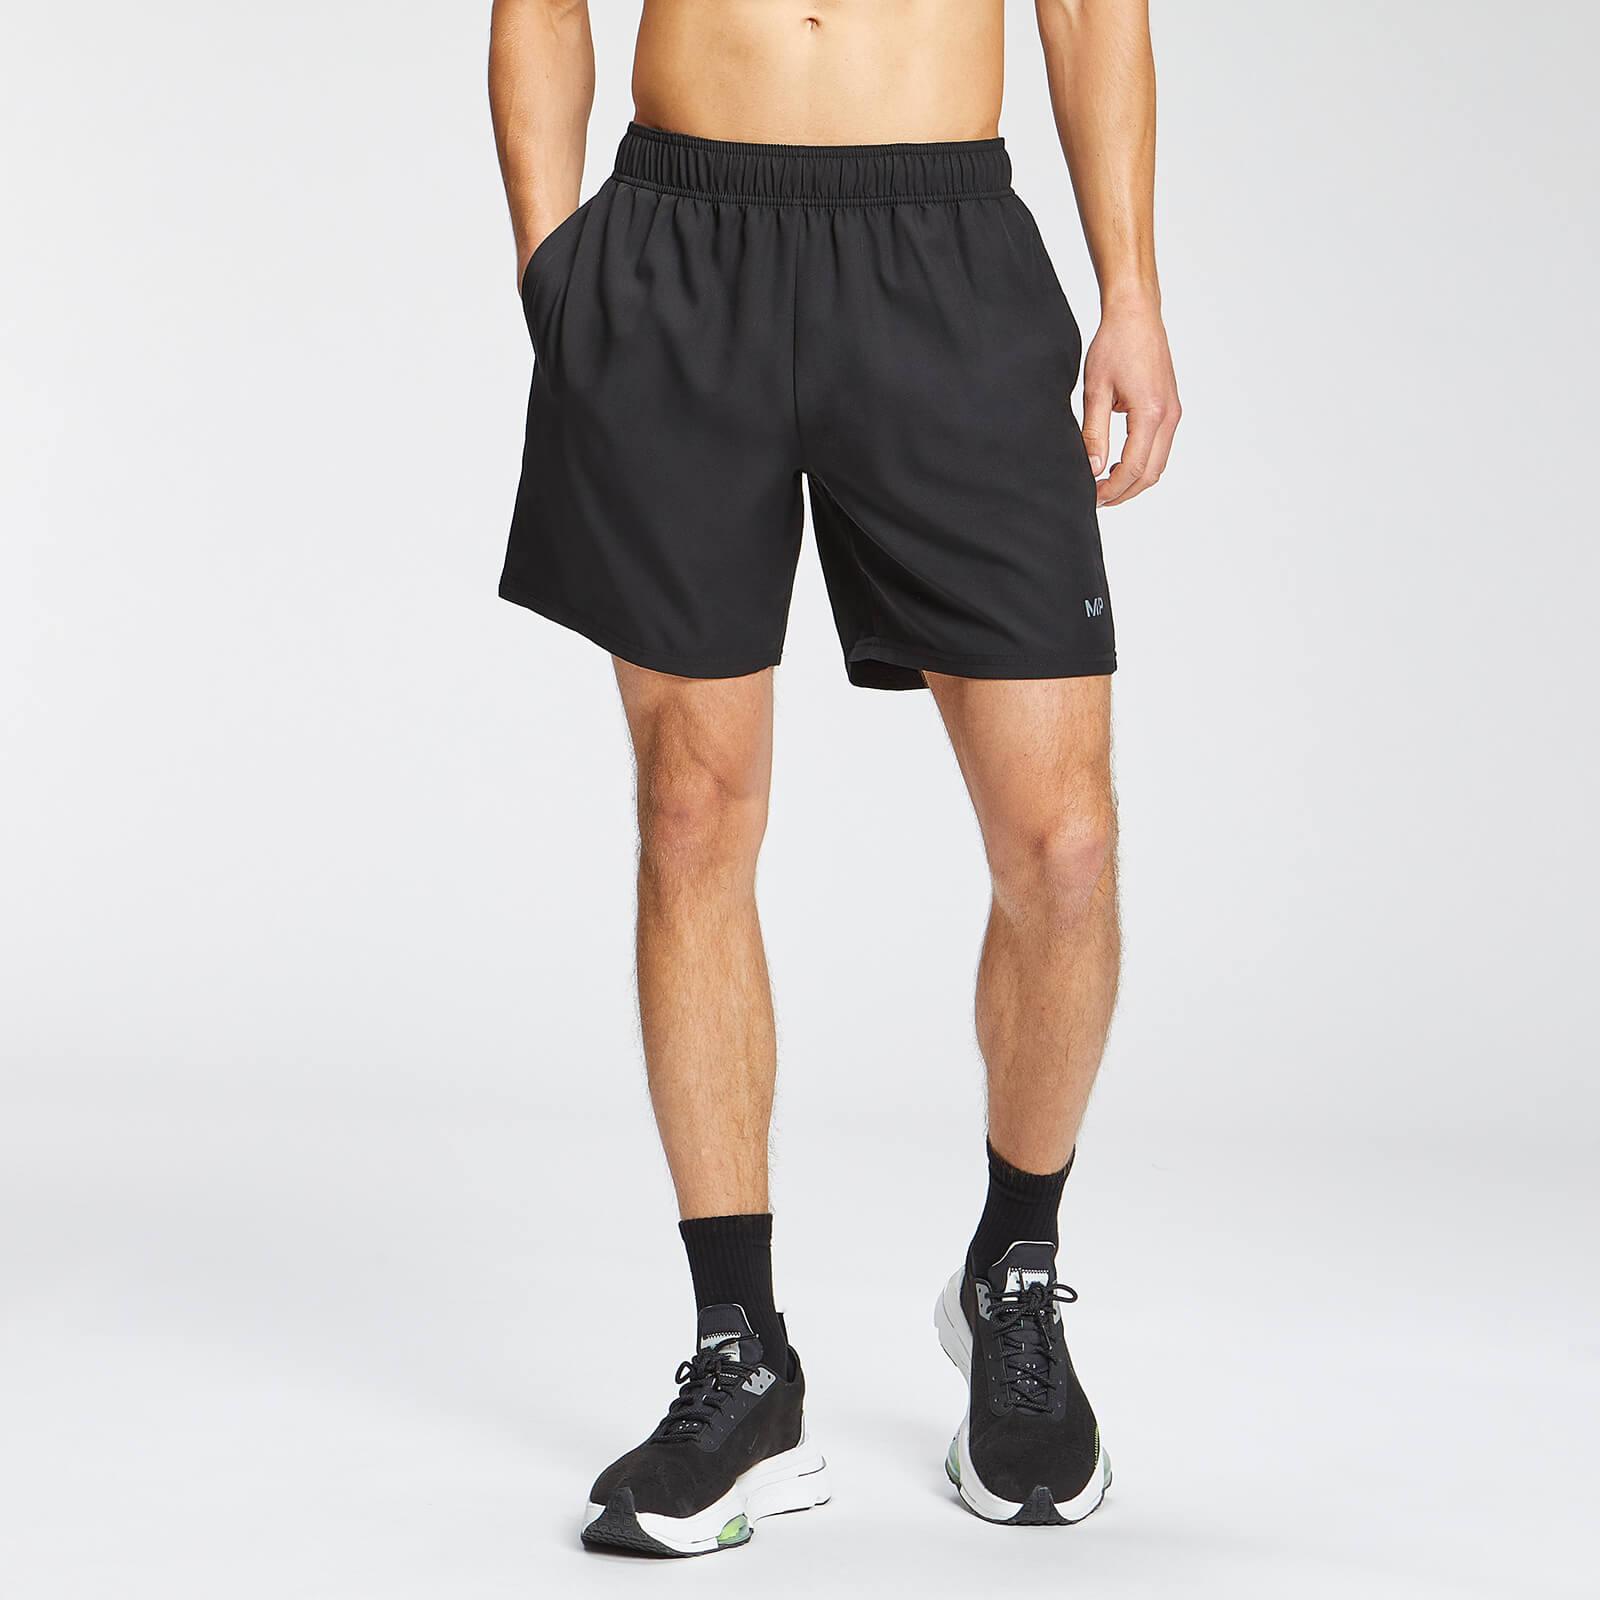 Купить MP Men's Repeat Graphic Training Shorts - Black - XXL, Myprotein International